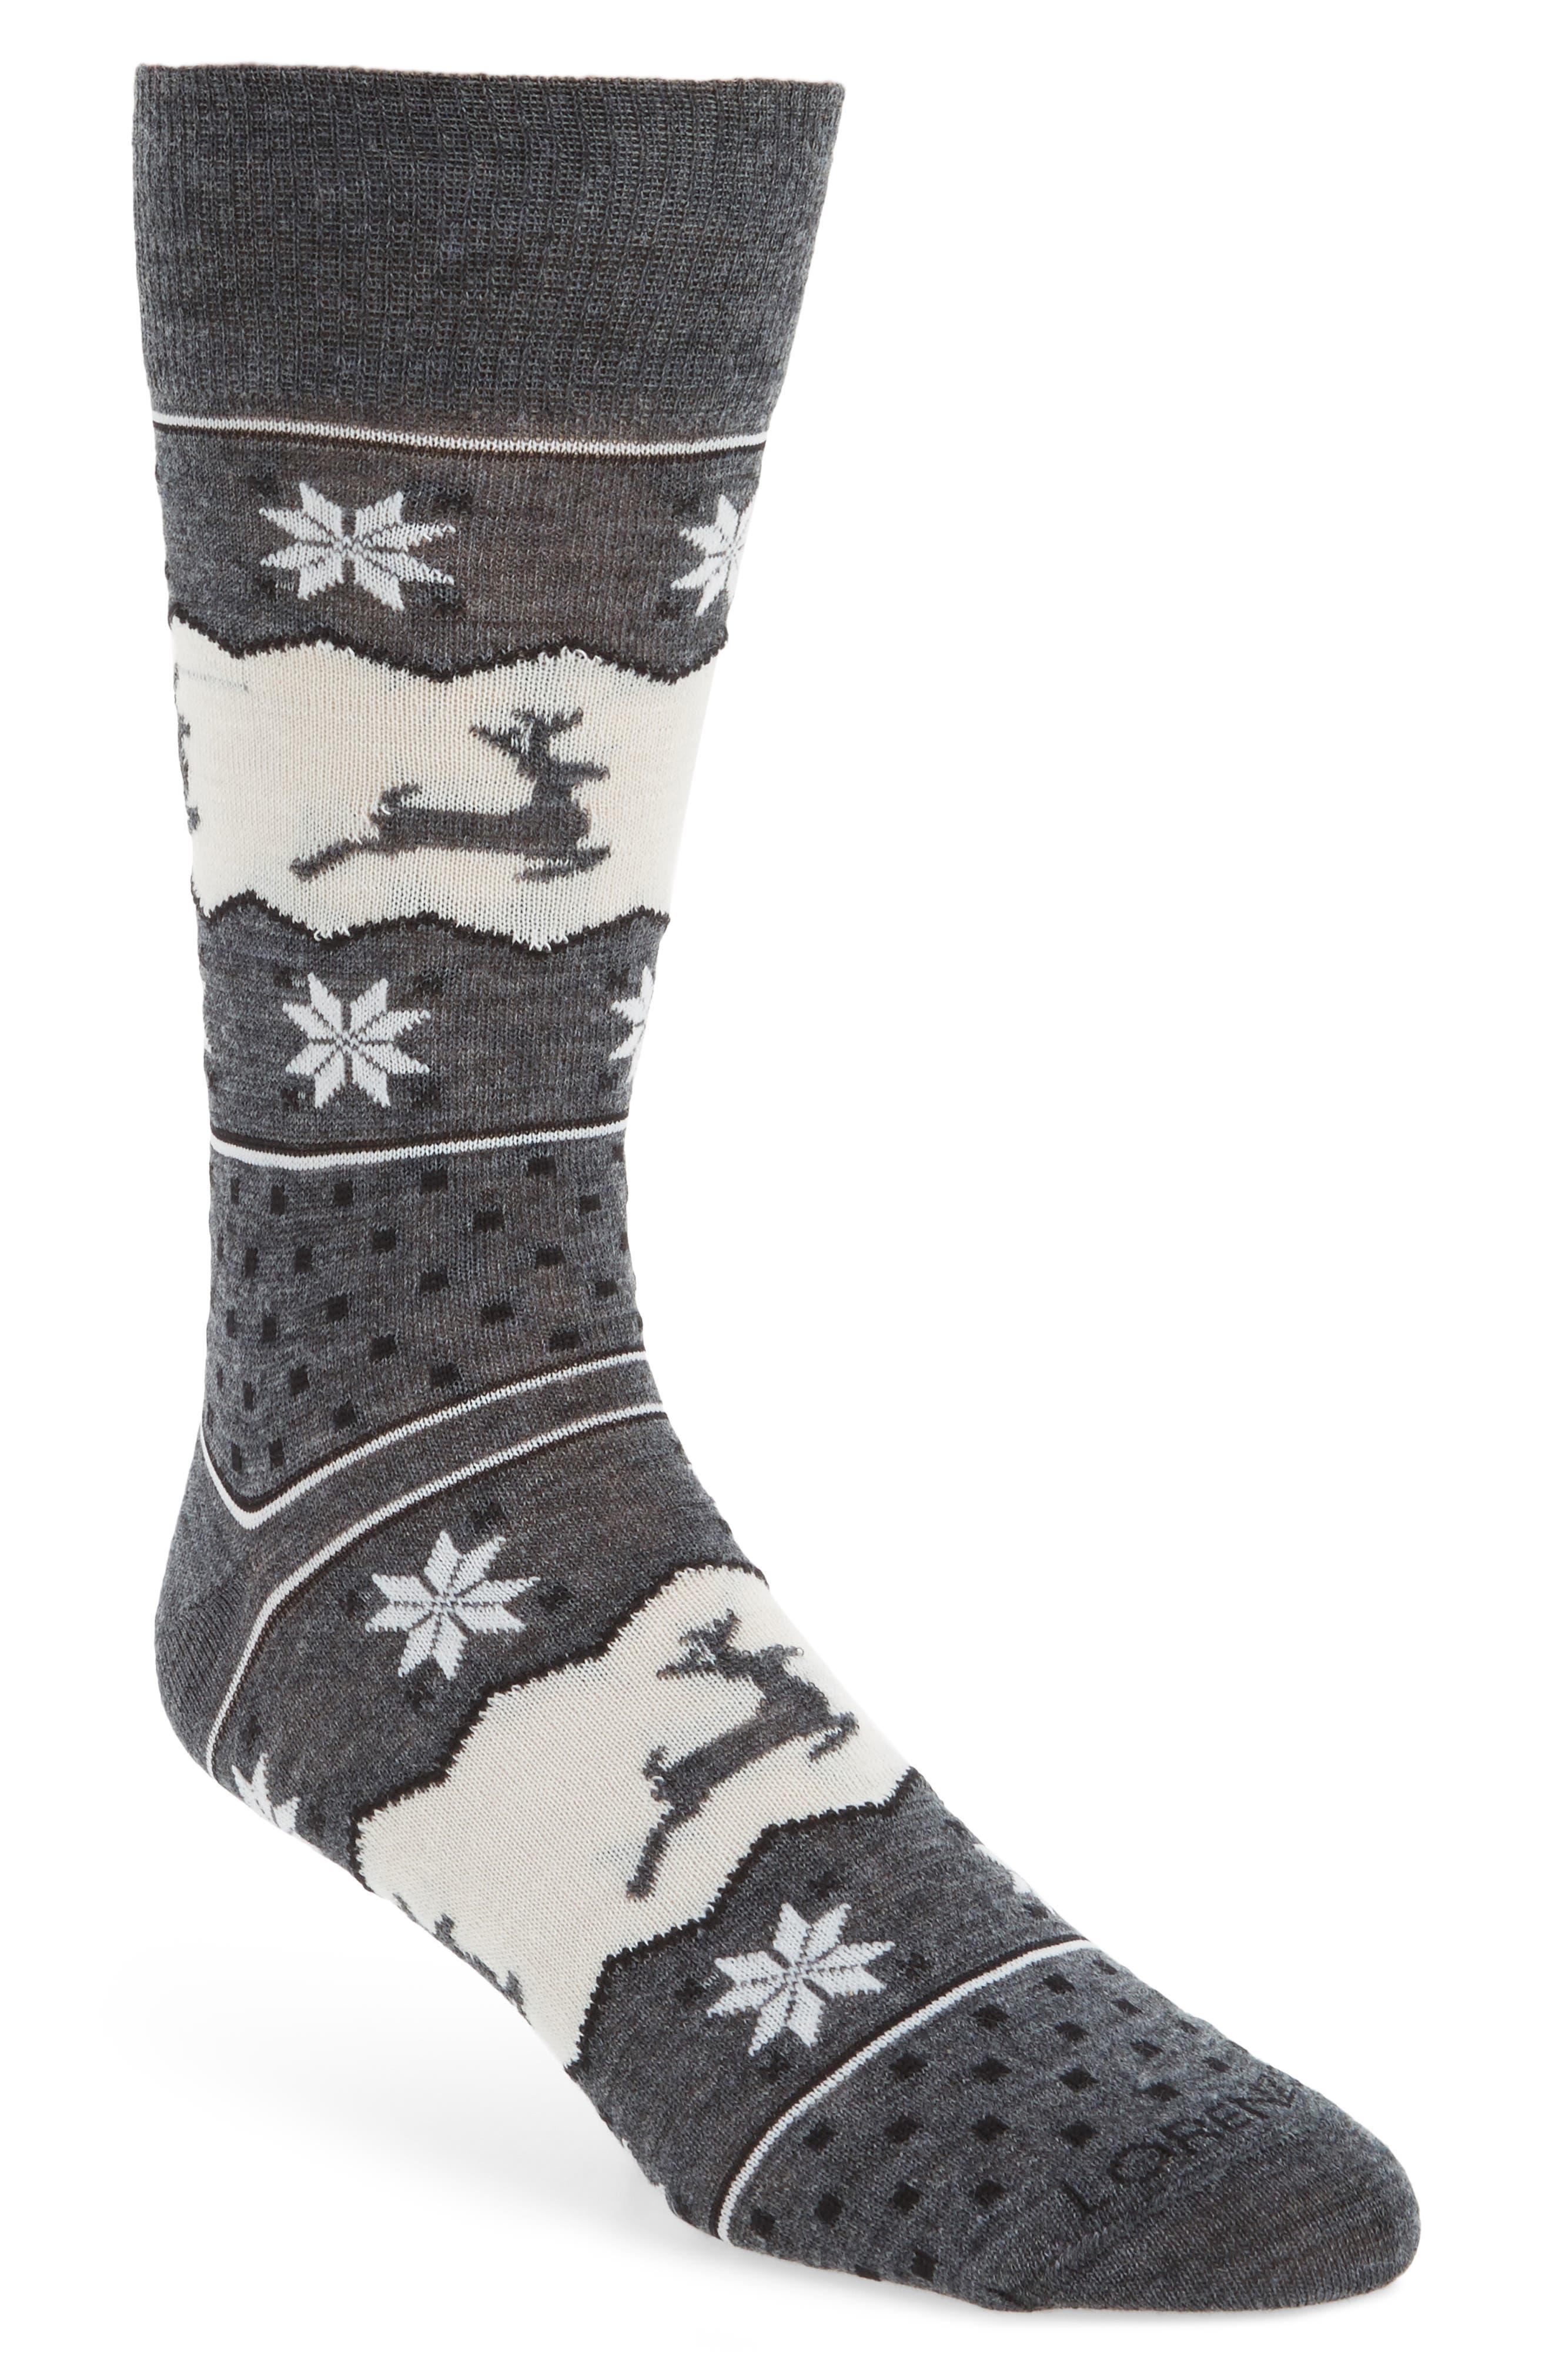 Lorenzo Uomo Fair Aisle Reindeer Socks